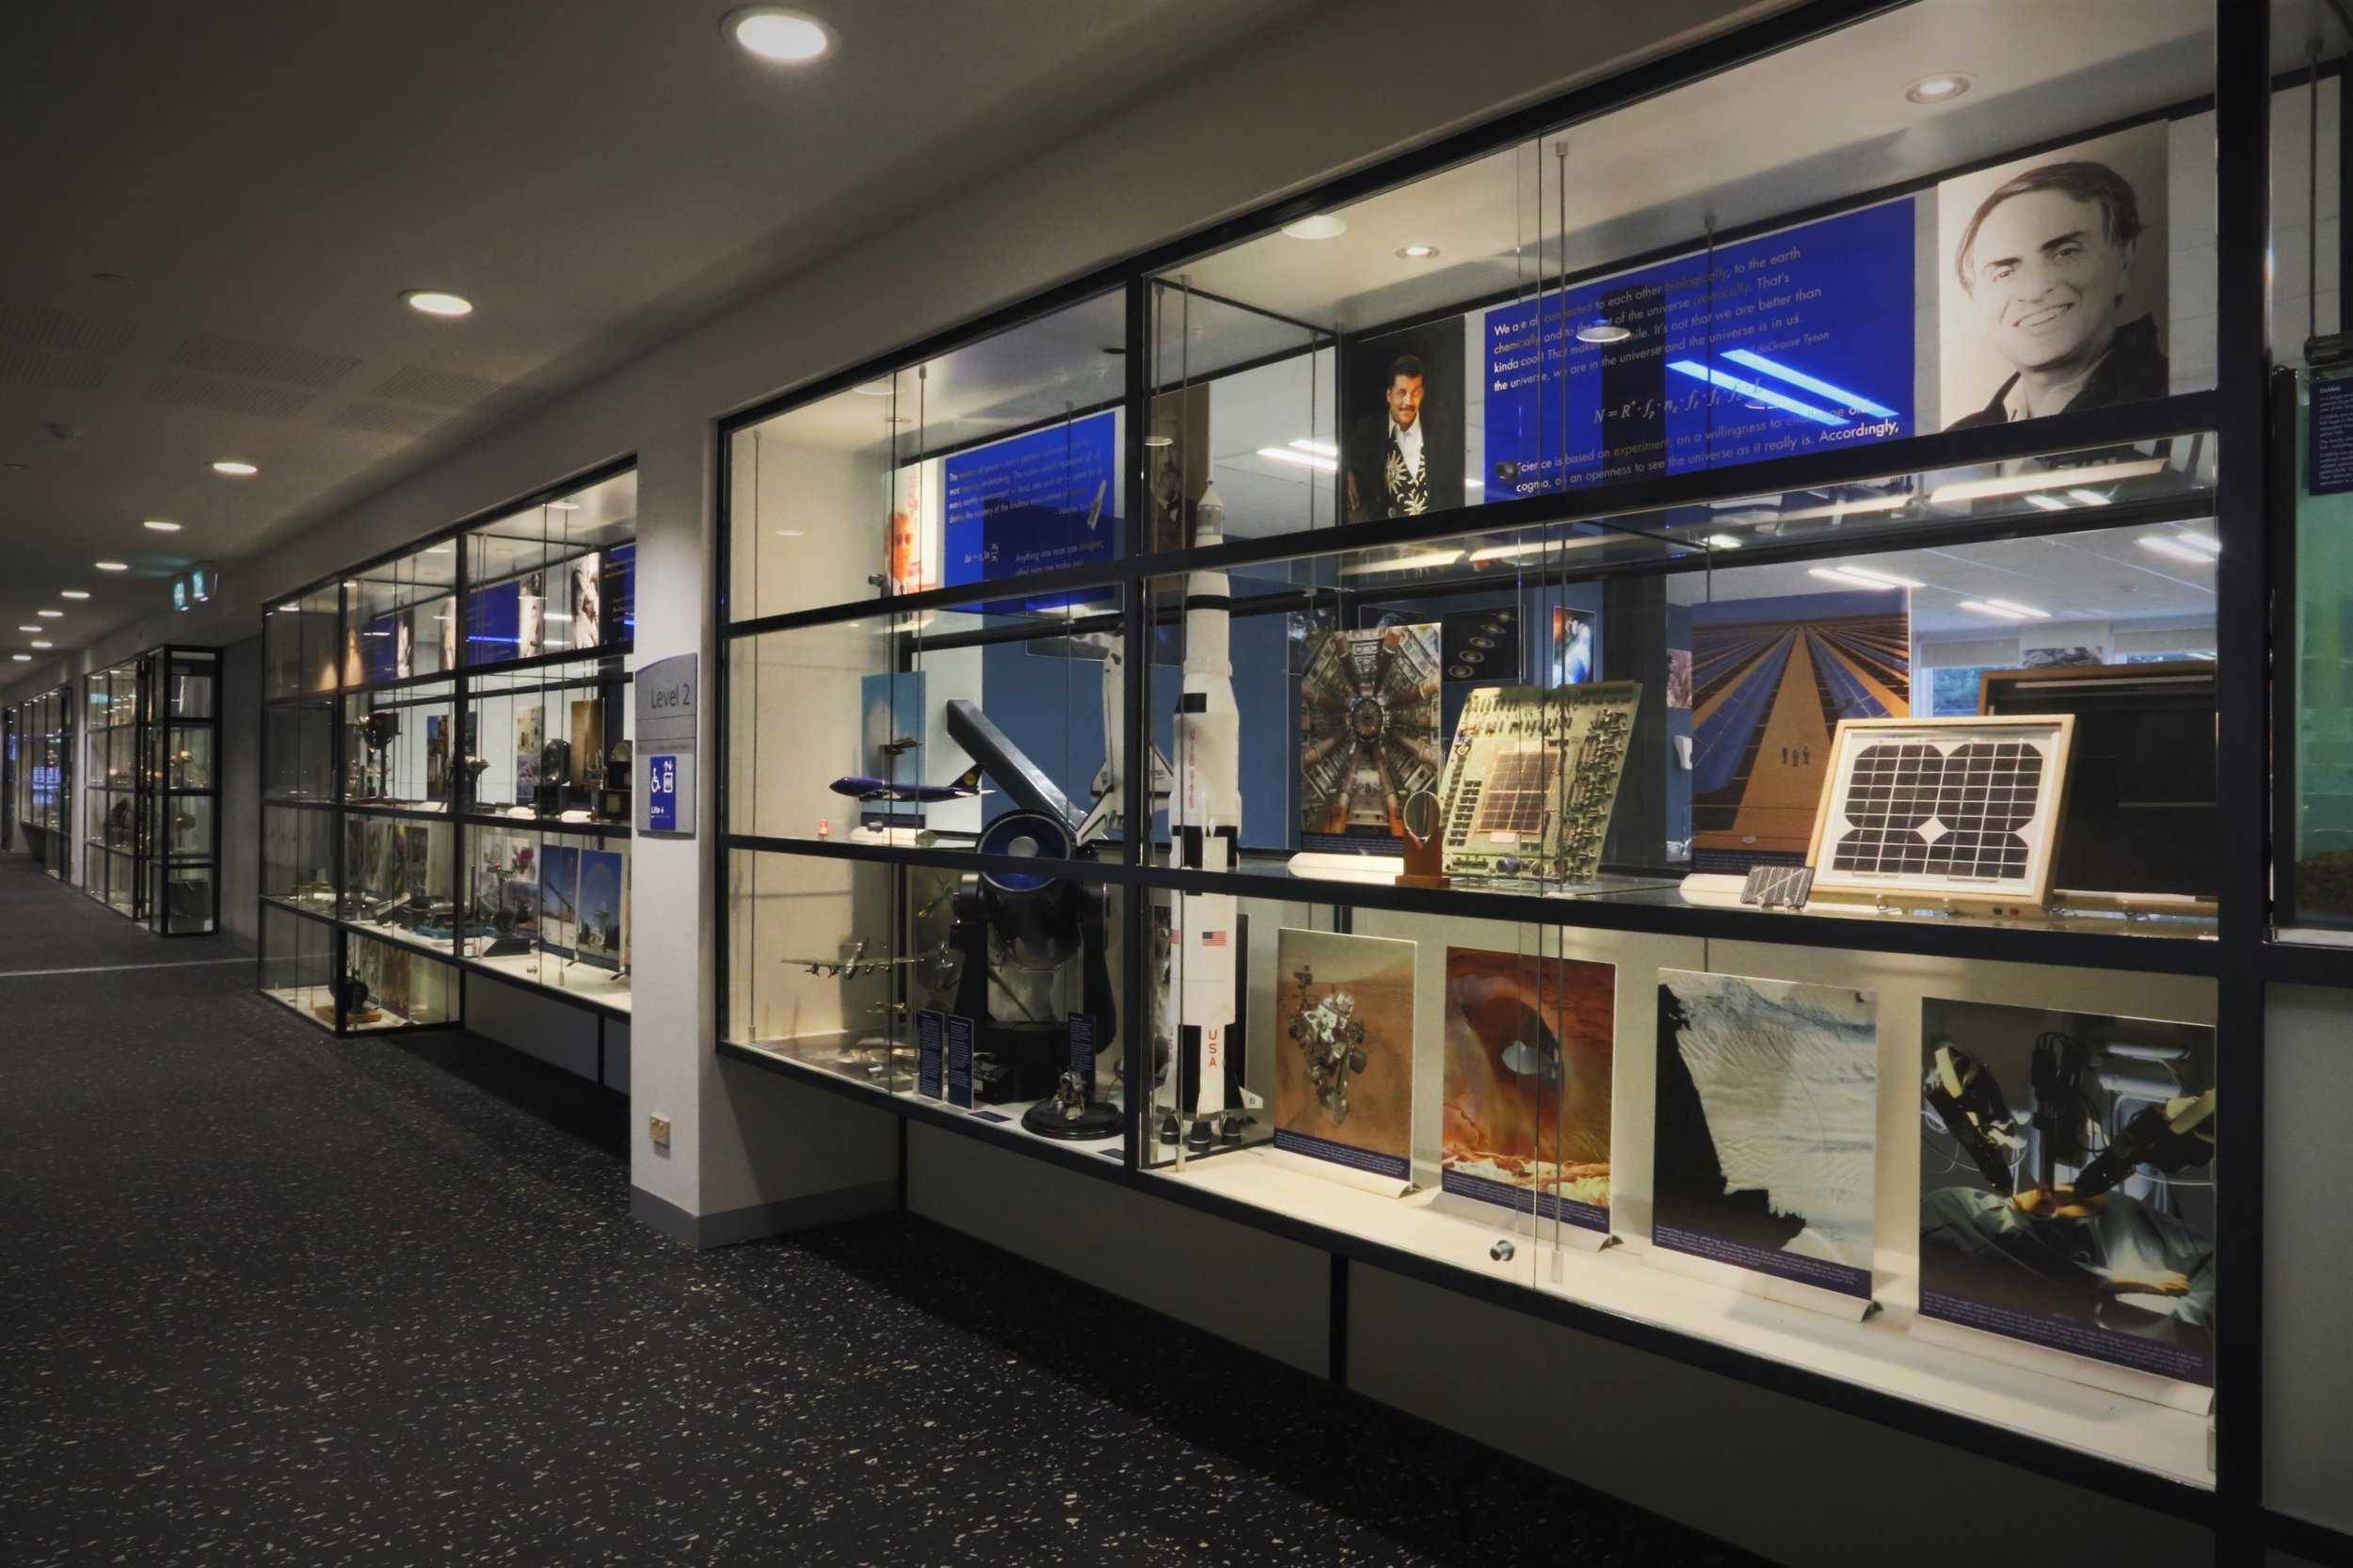 Journey Through Science exhibition